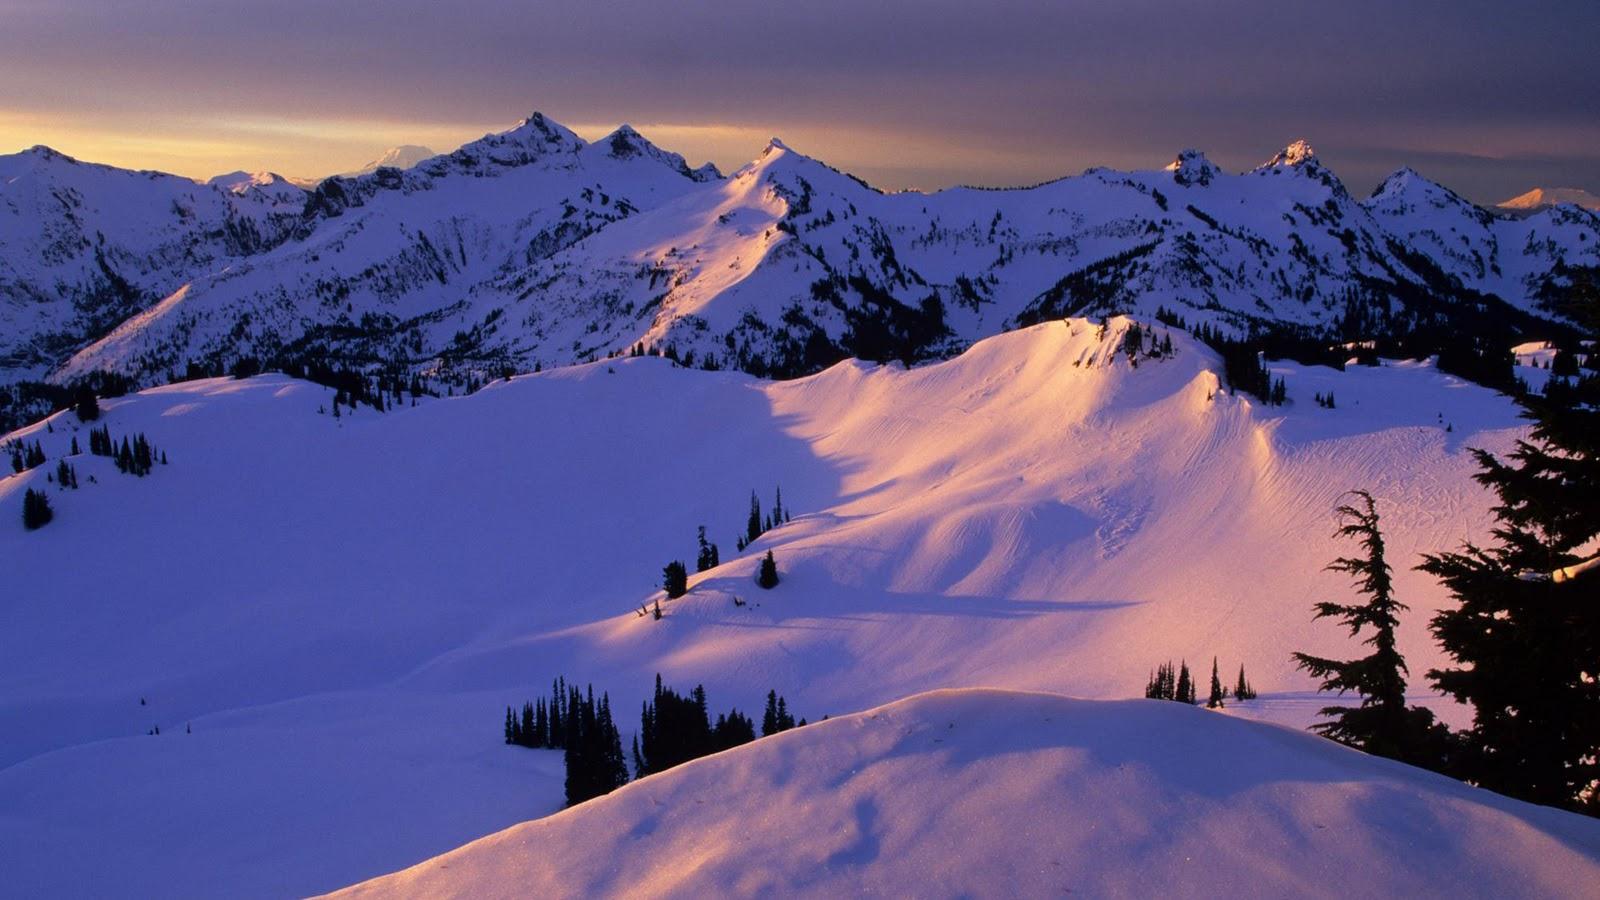 snow mountain wallpaper hd - photo #19